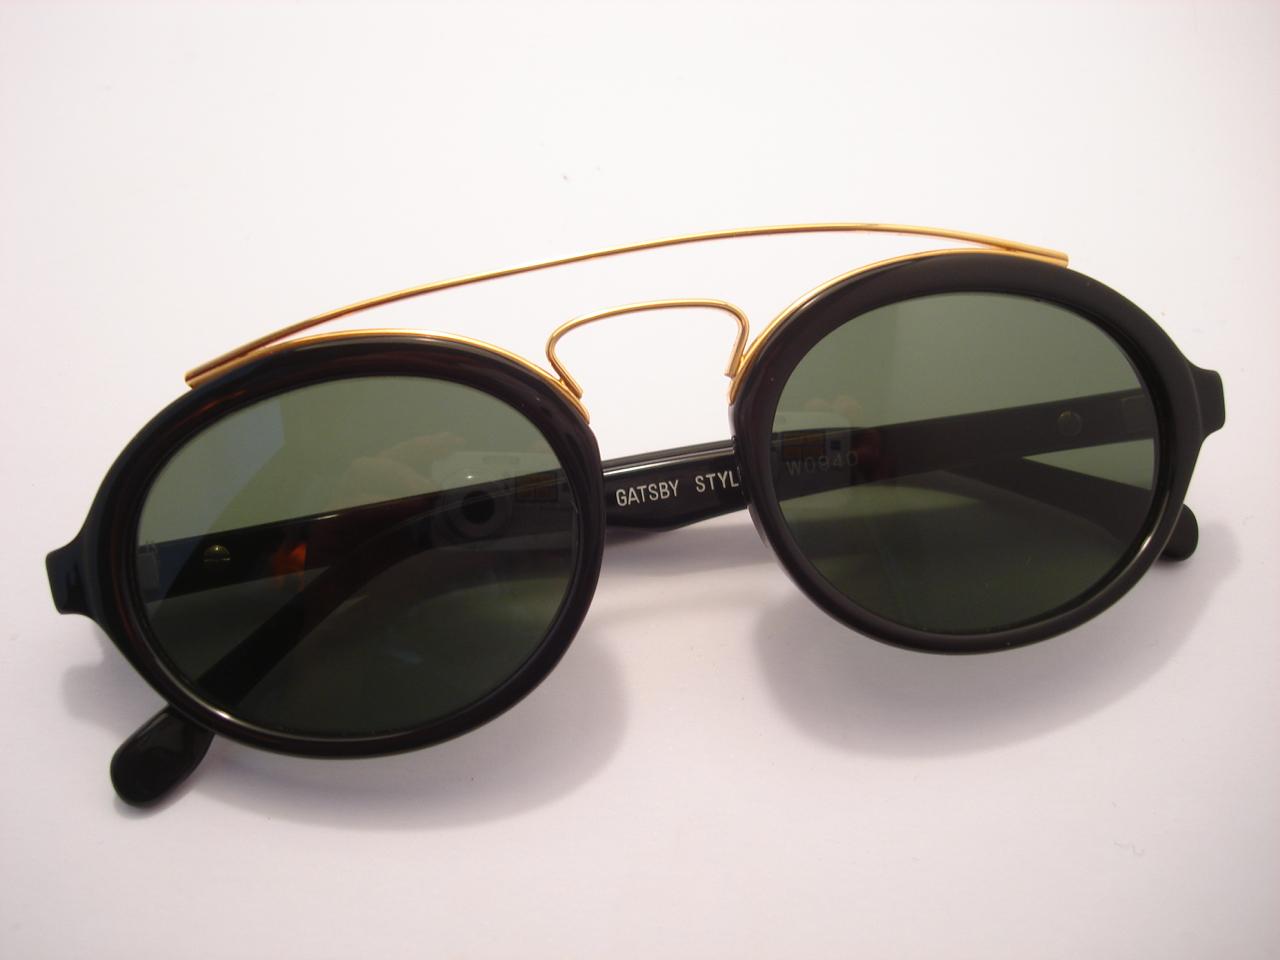 309dca74d5 Ray Ban Vintage Round Sunglasses « Heritage Malta